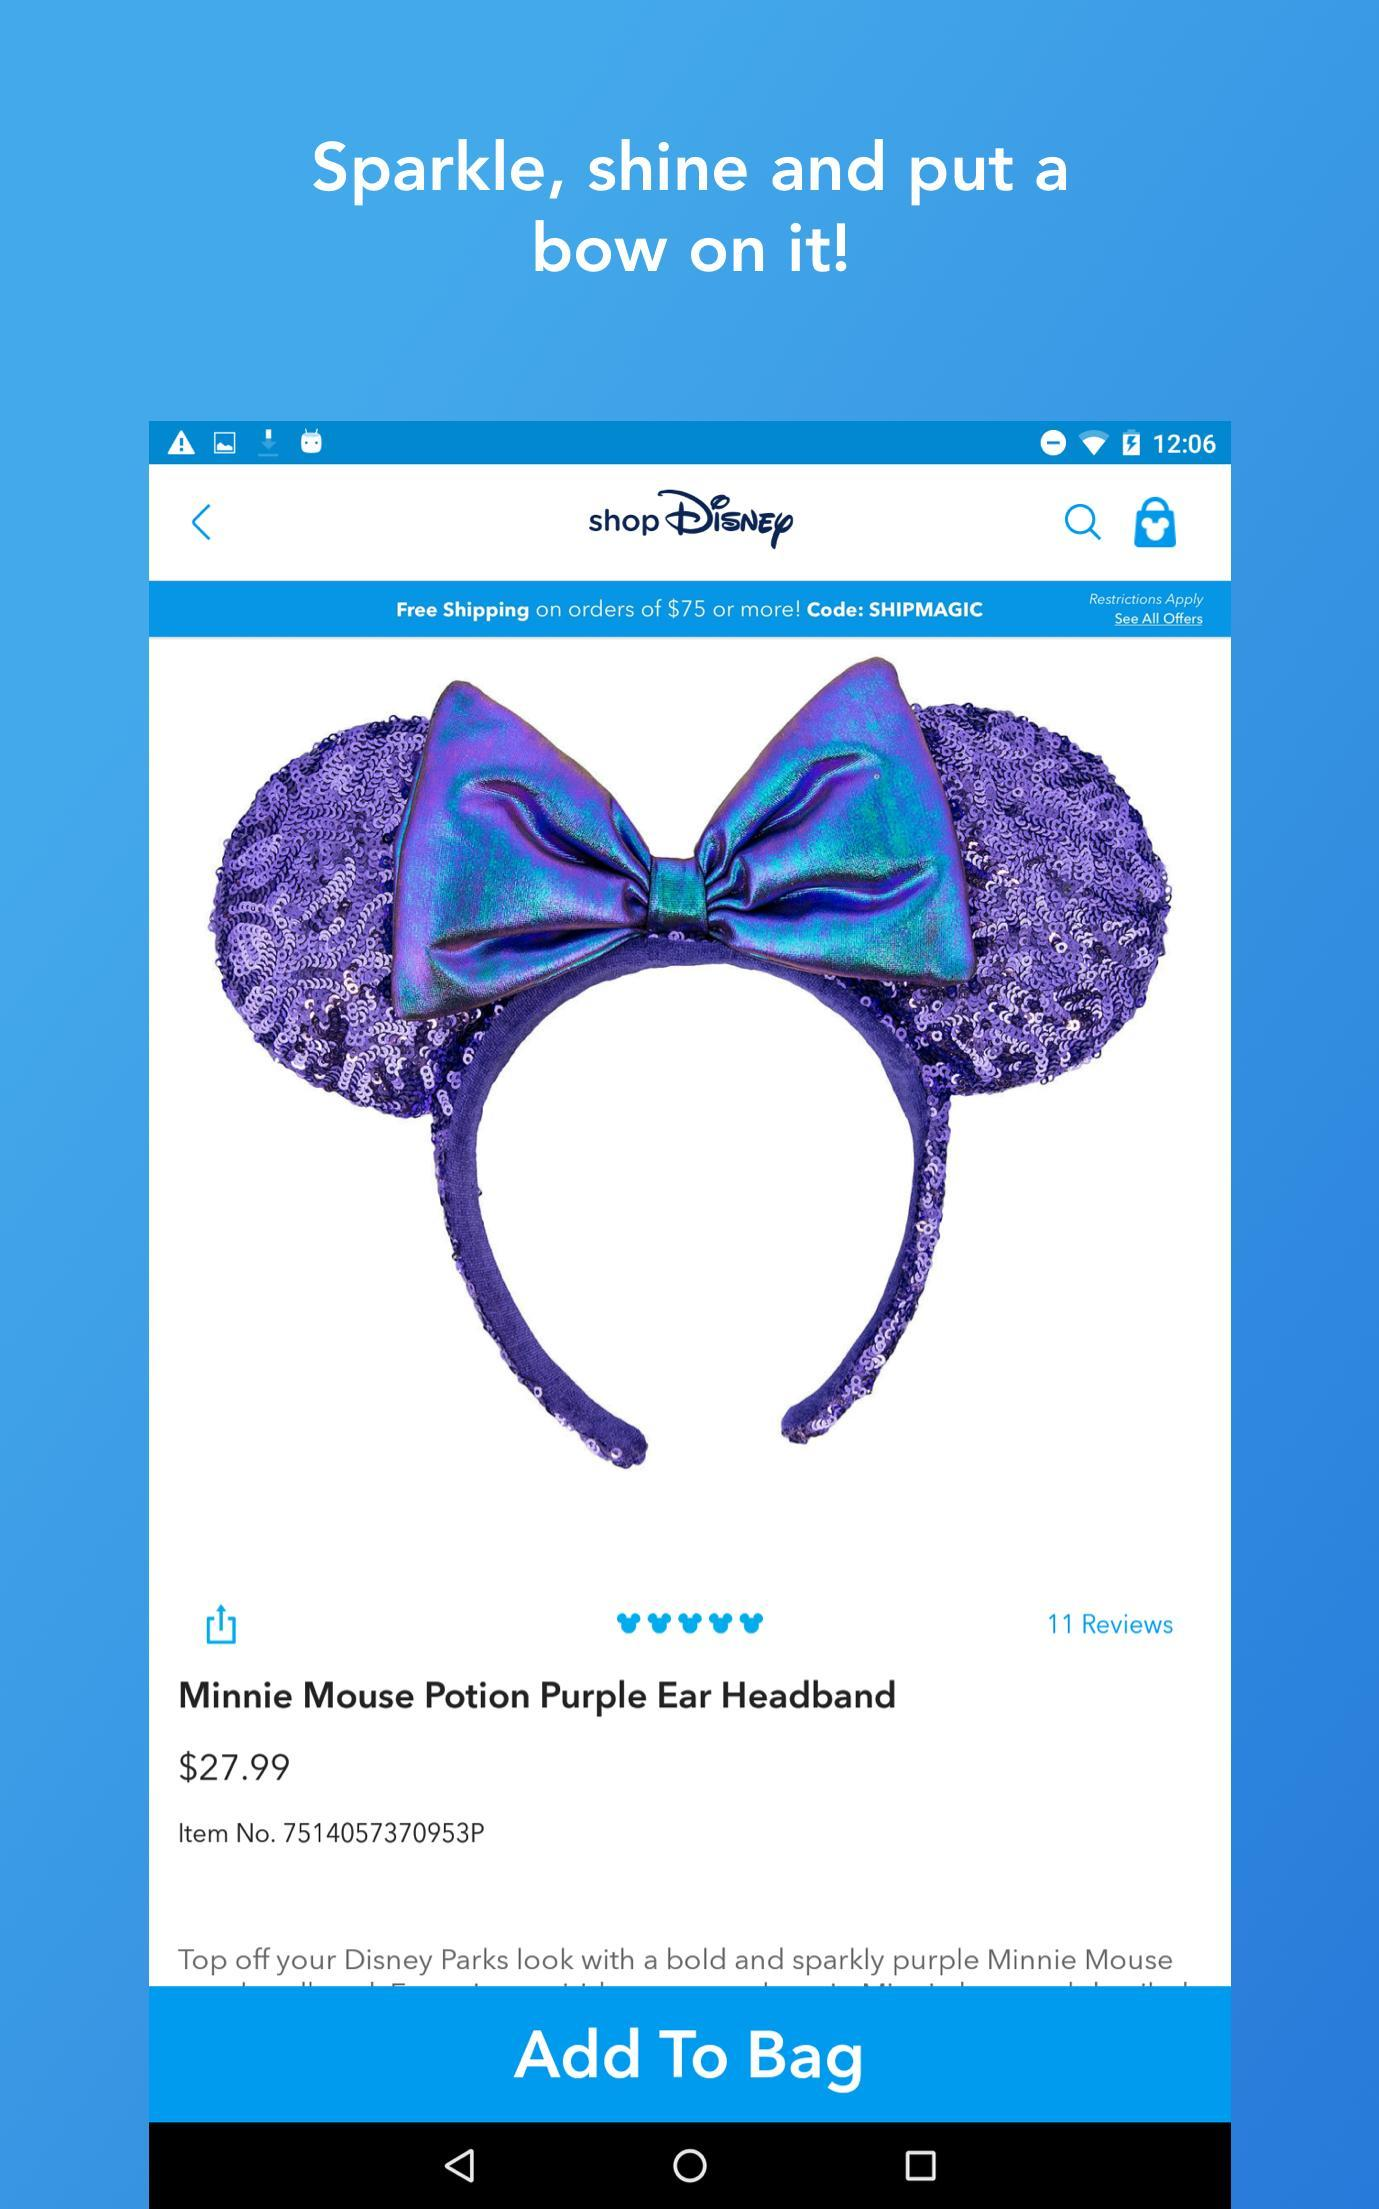 Shop Disney 3.1.1 Screenshot 14